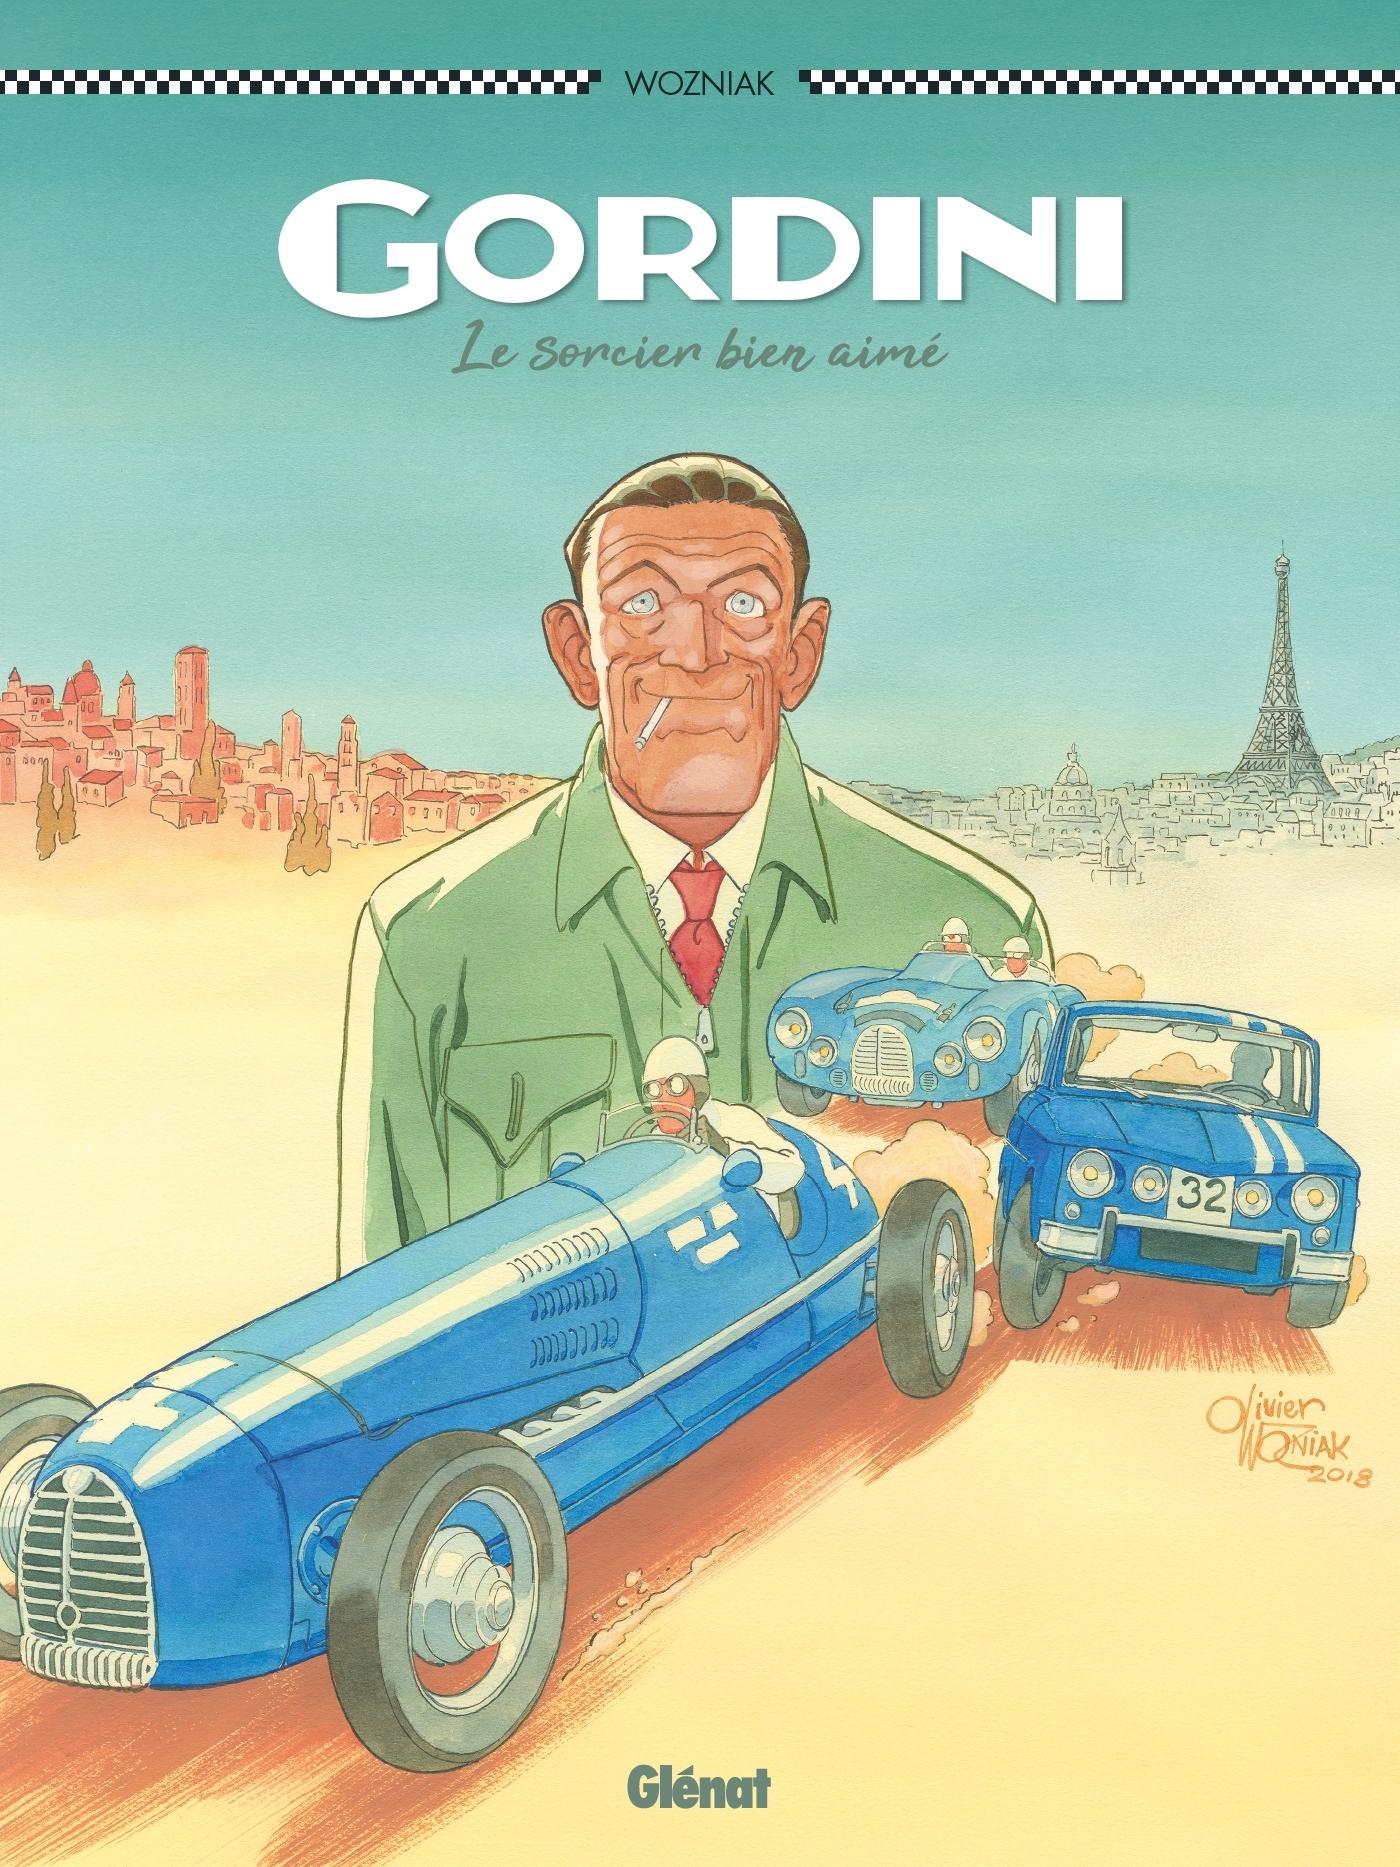 GORDINI, LE SORCIER BIEN AIME